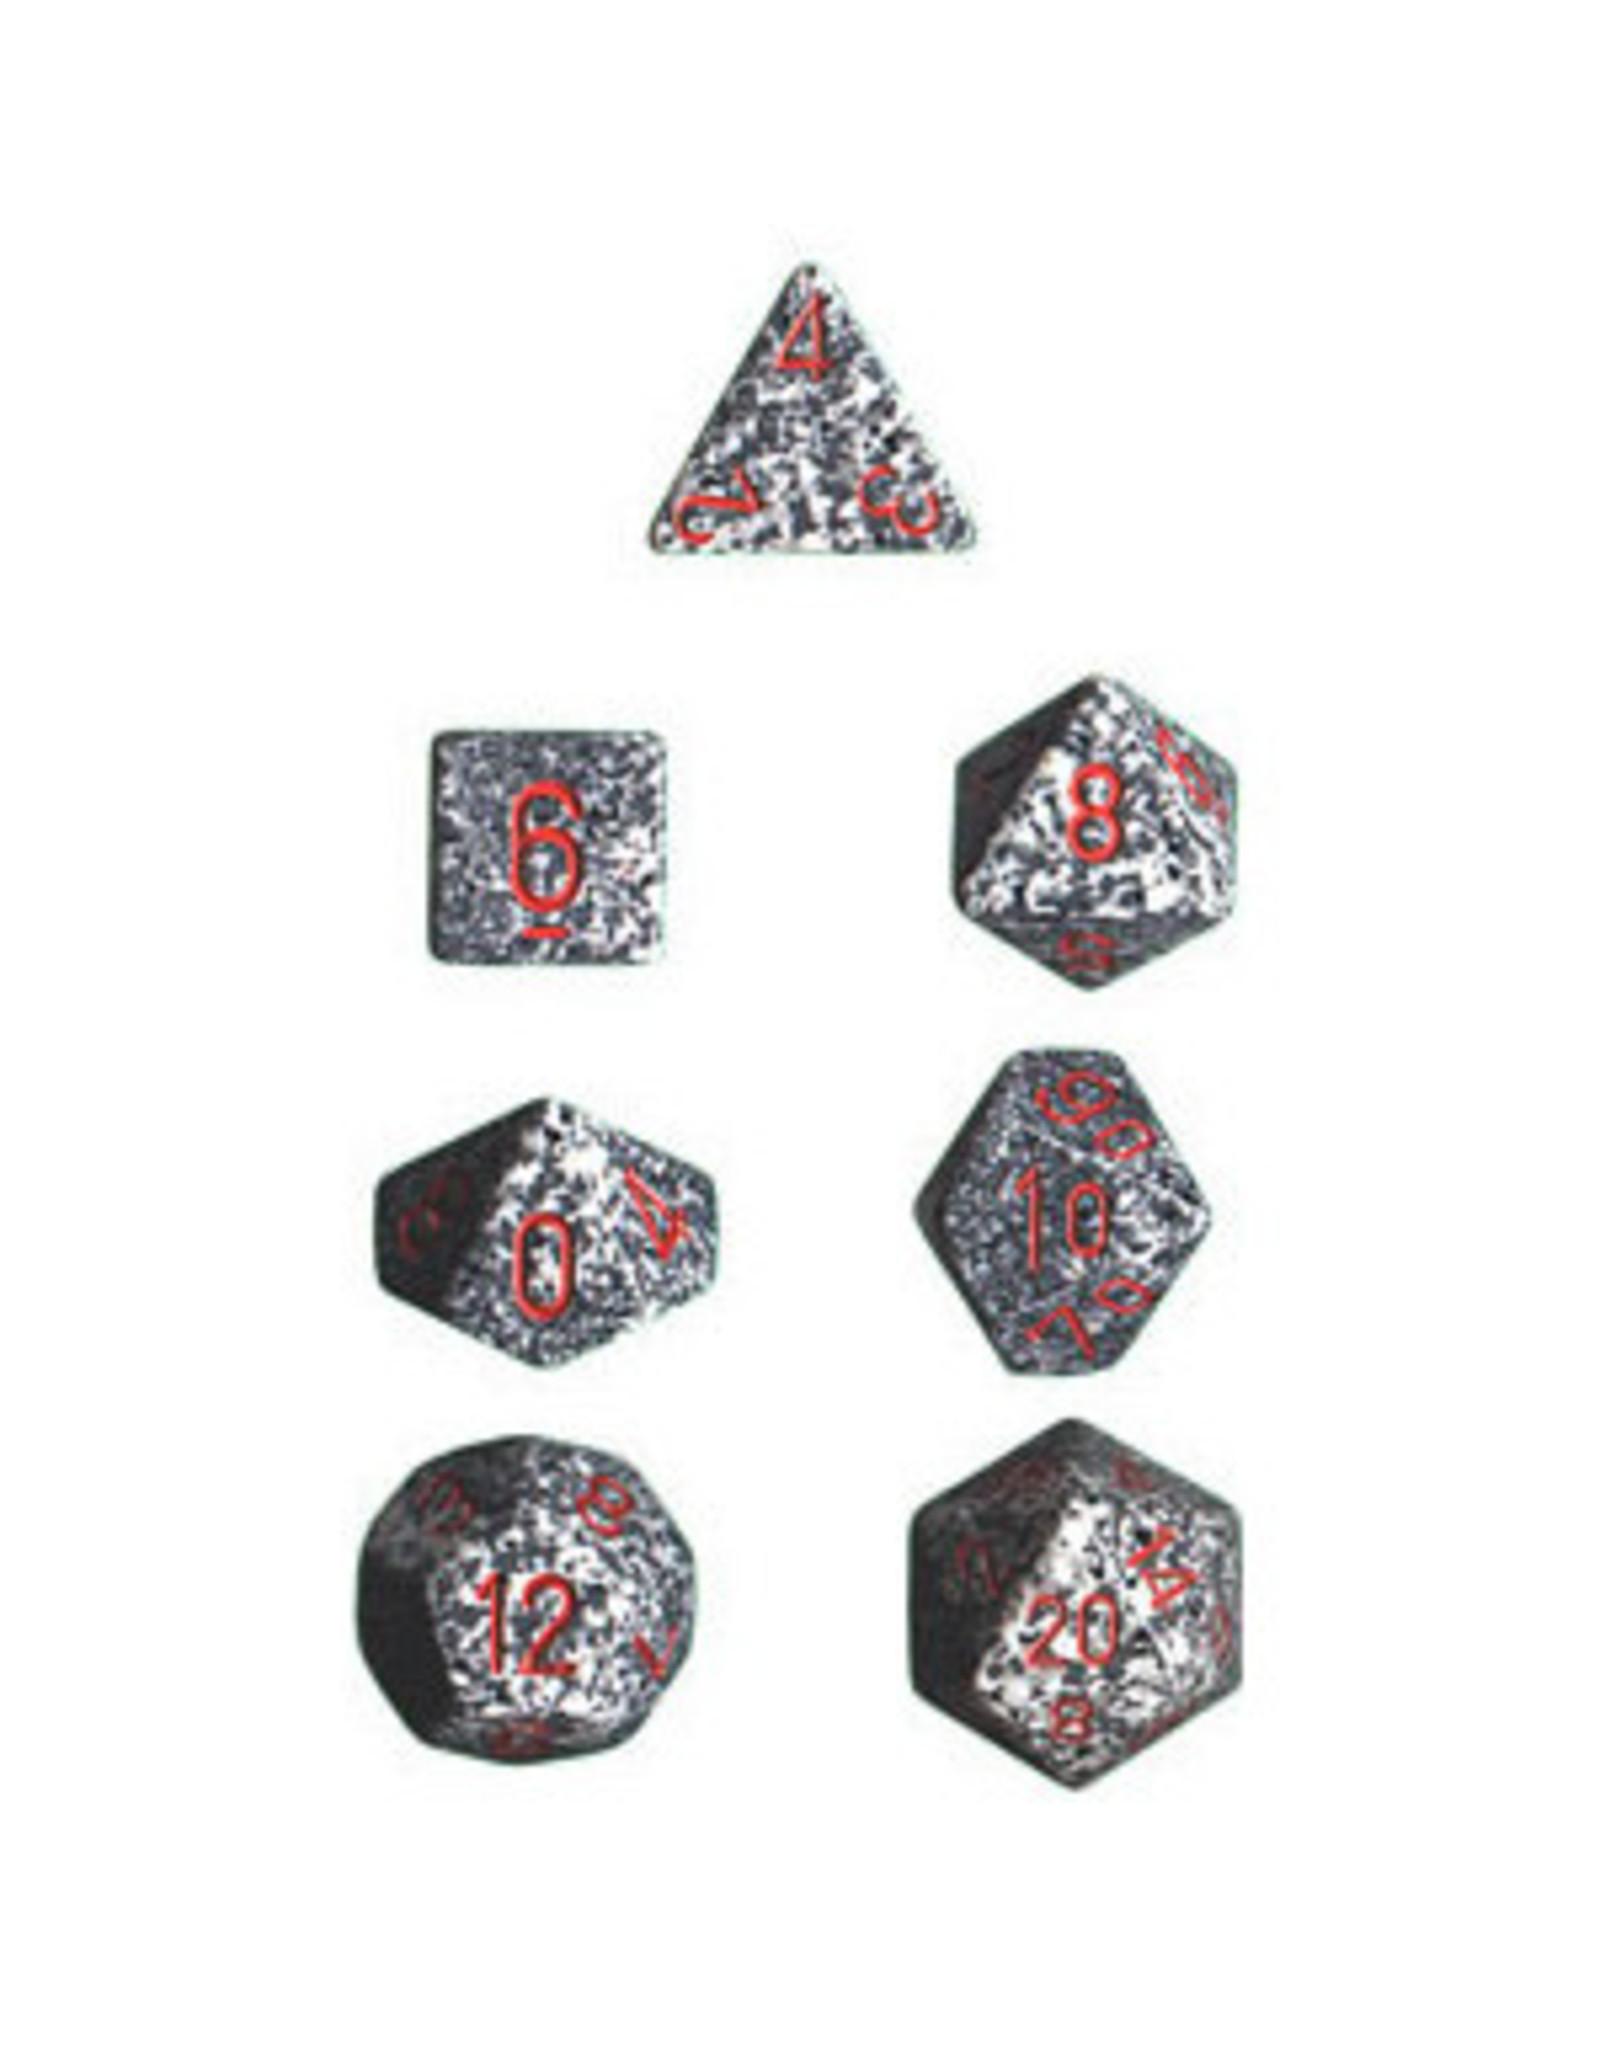 Chessex 7-Set Polyhedral Granite